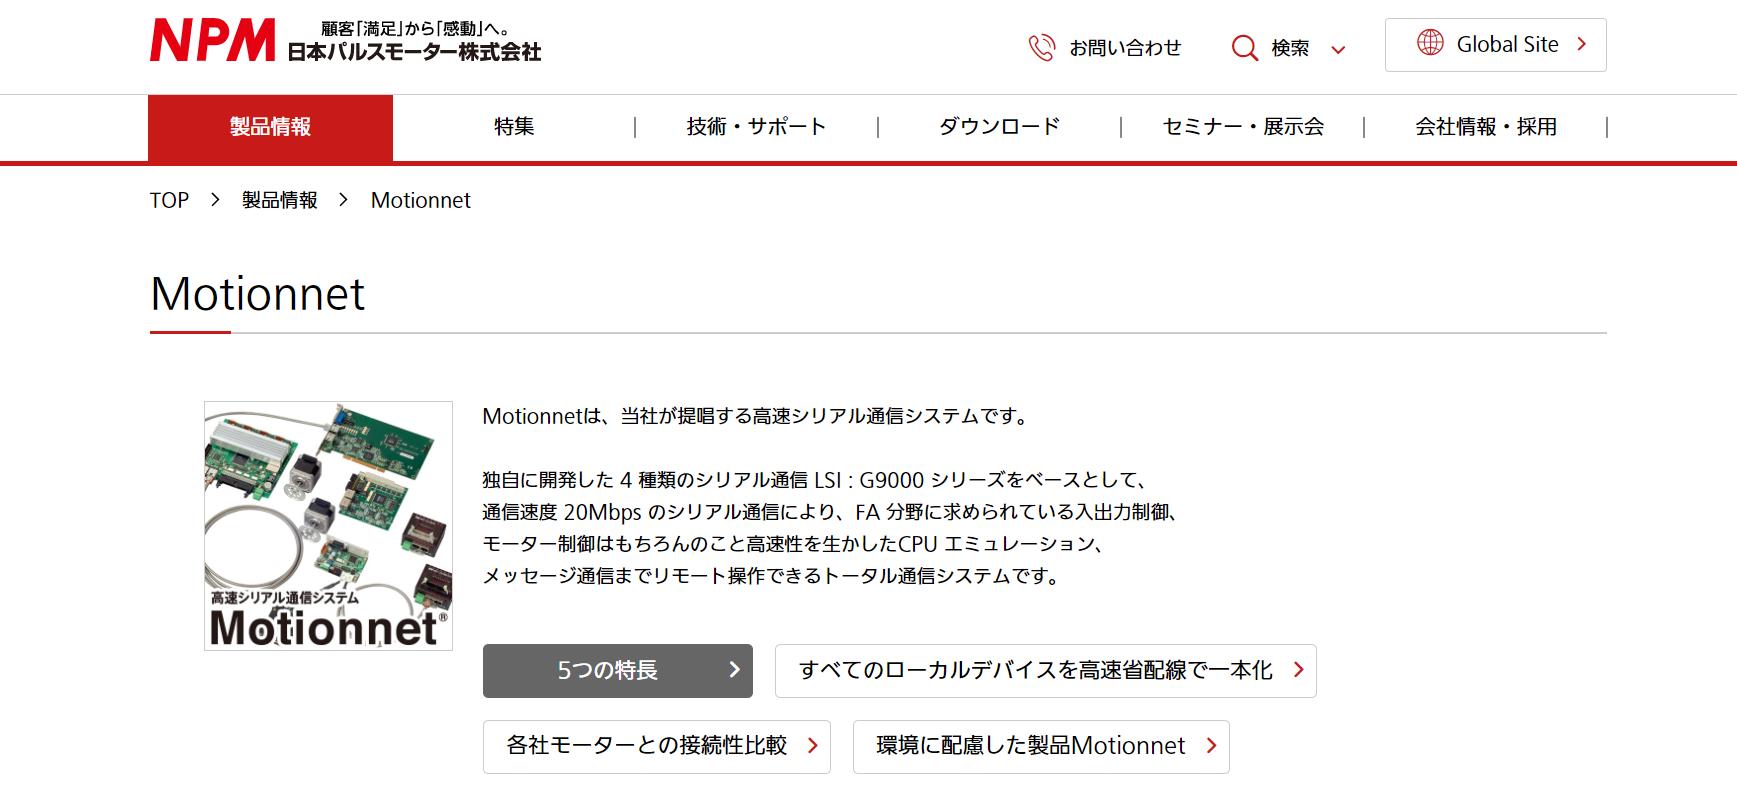 Motionnet(モーションネット)